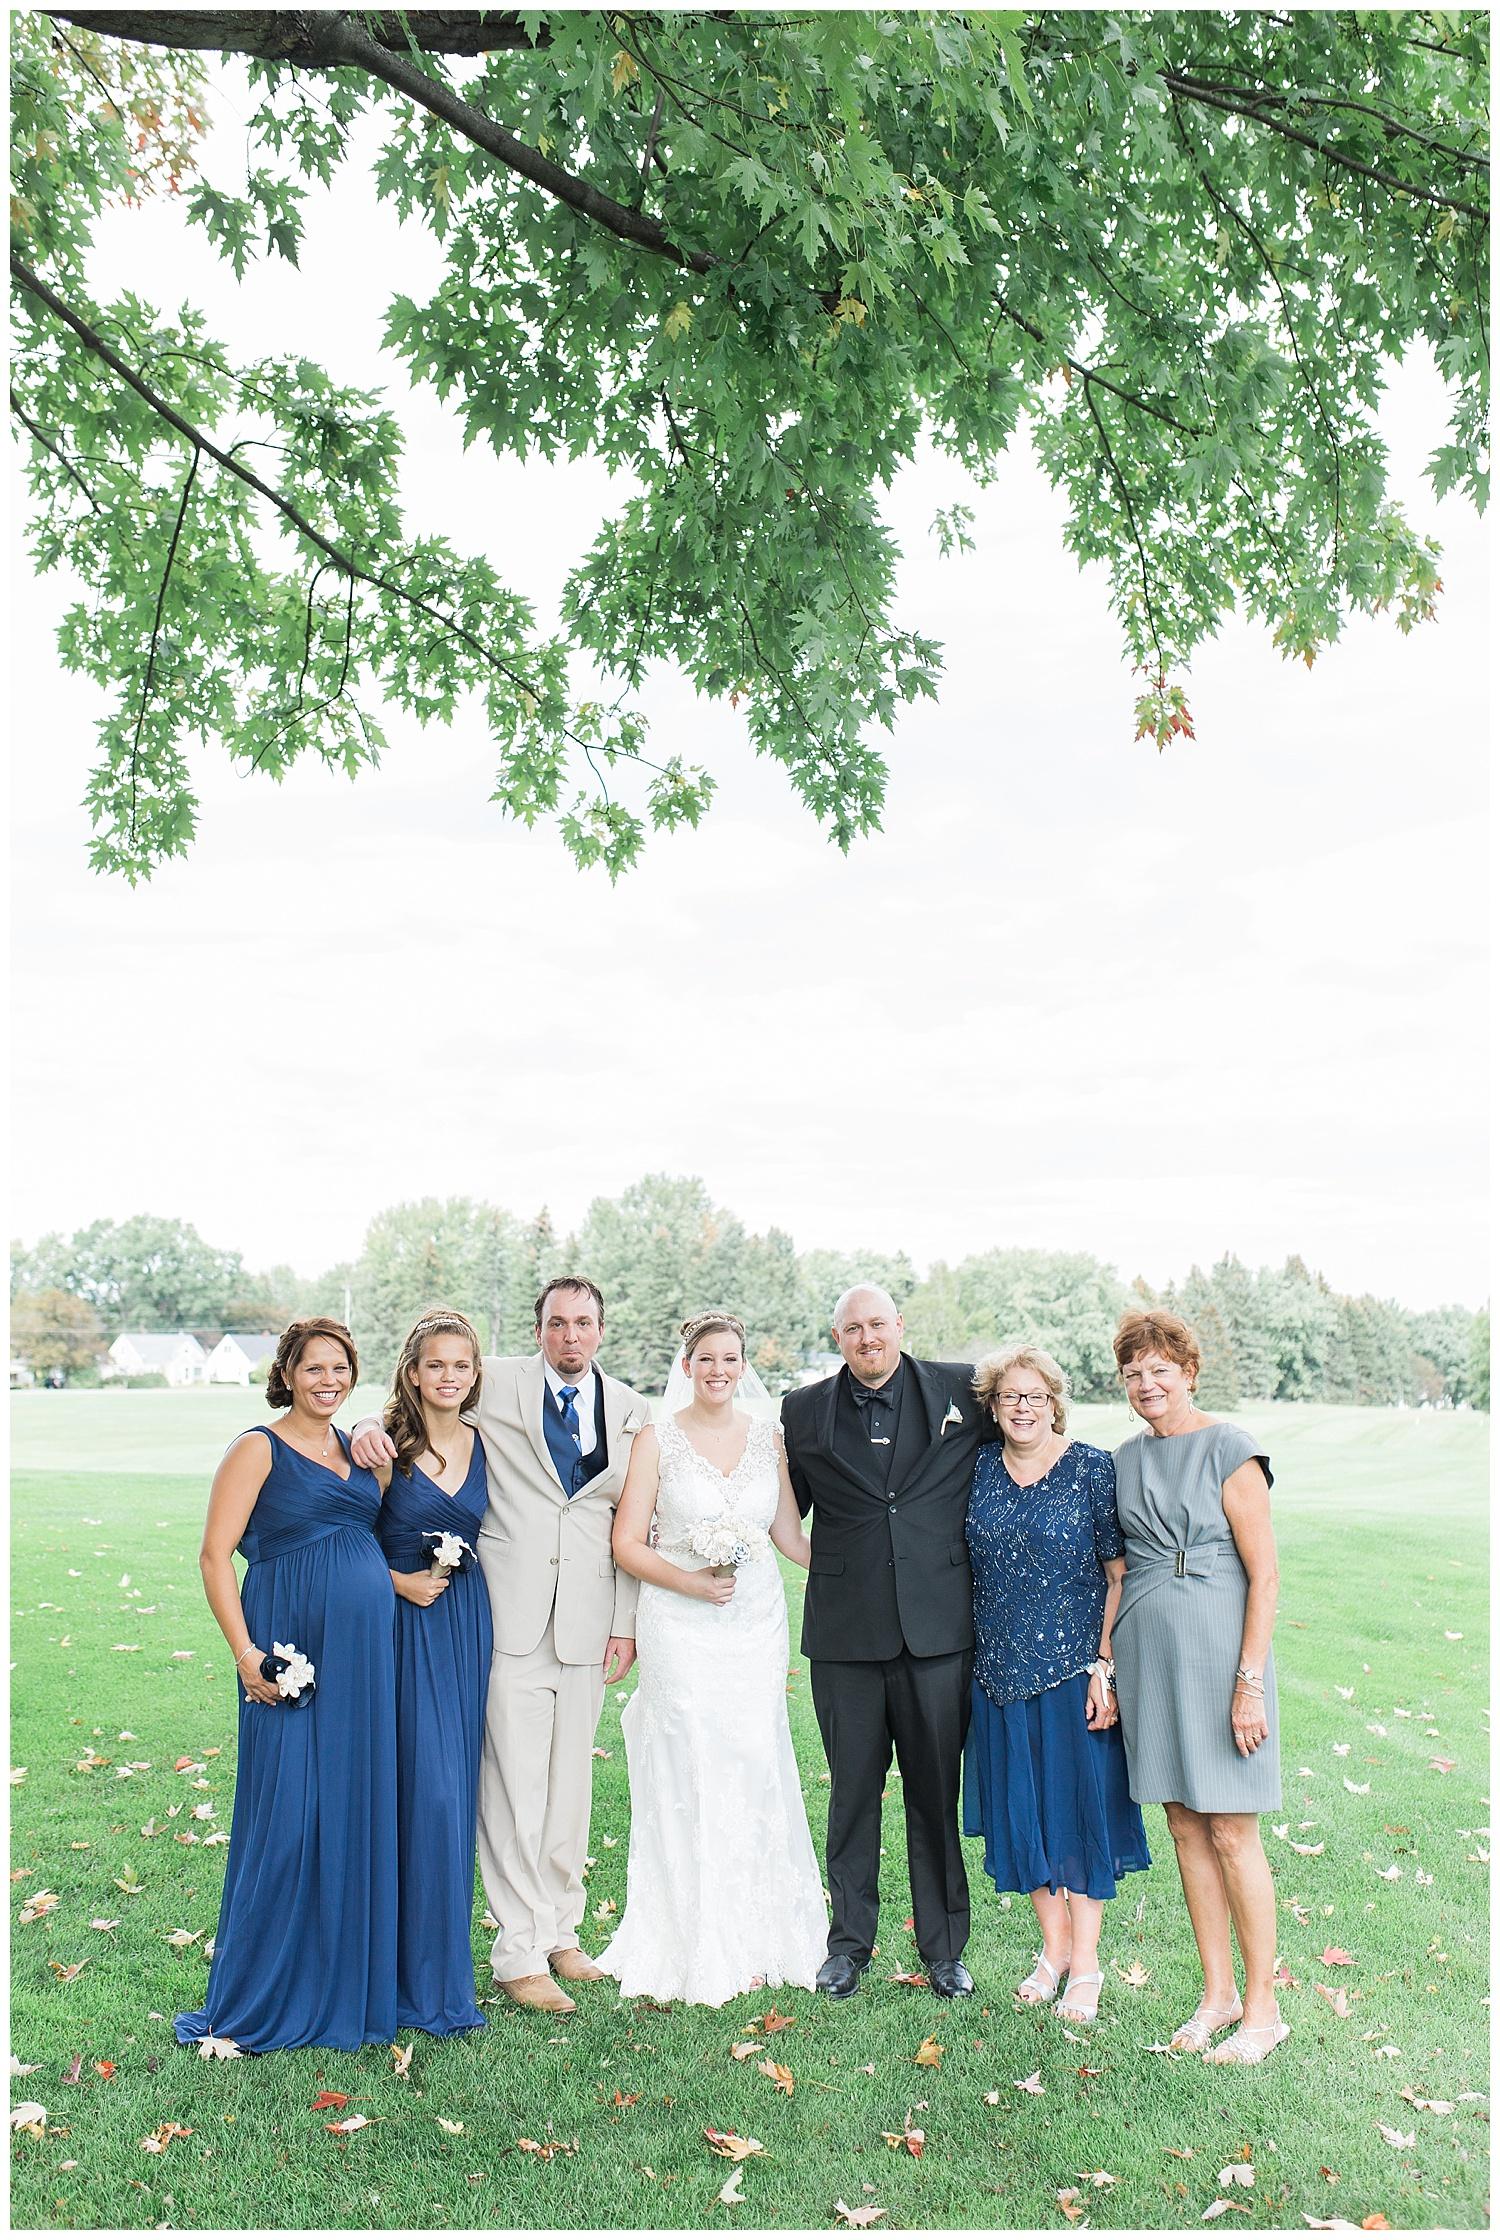 Jessica and Scott McKay - Terry Hills Golf Course - Batavia NY - Lass and Beau-121_Buffalo wedding photography.jpg